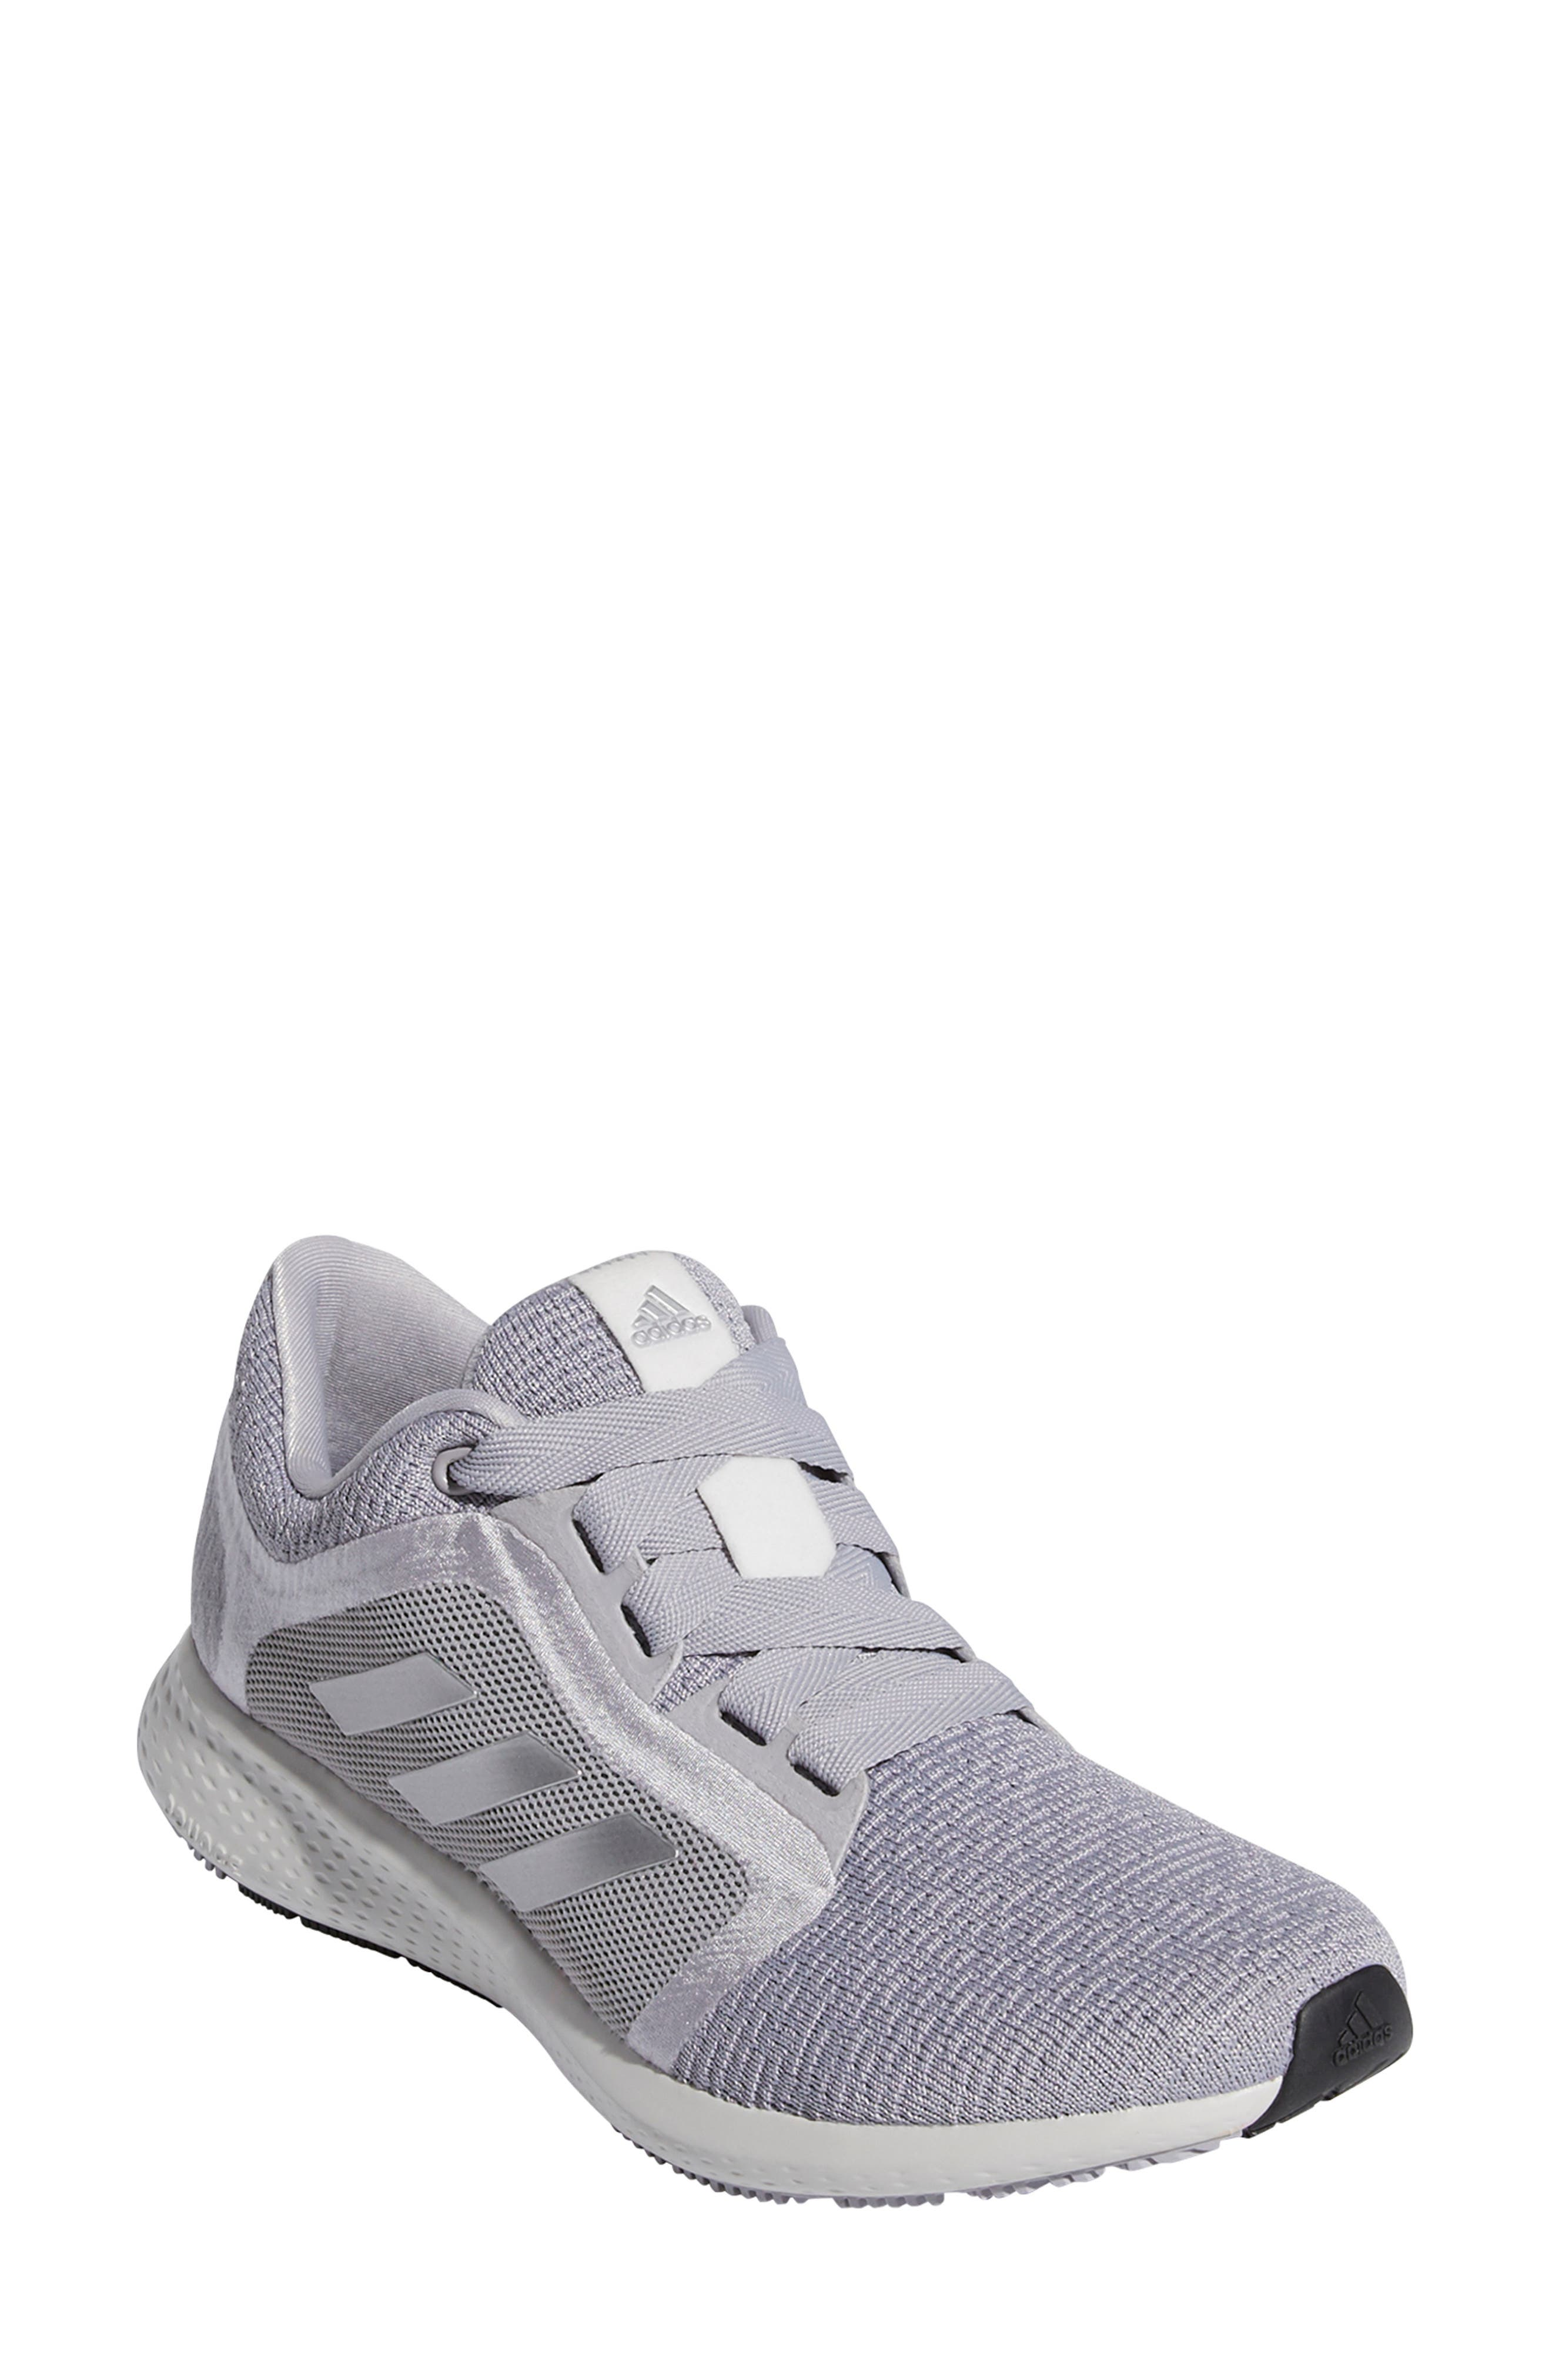 Adidas Edge Lux 4 Running Shoe, Size